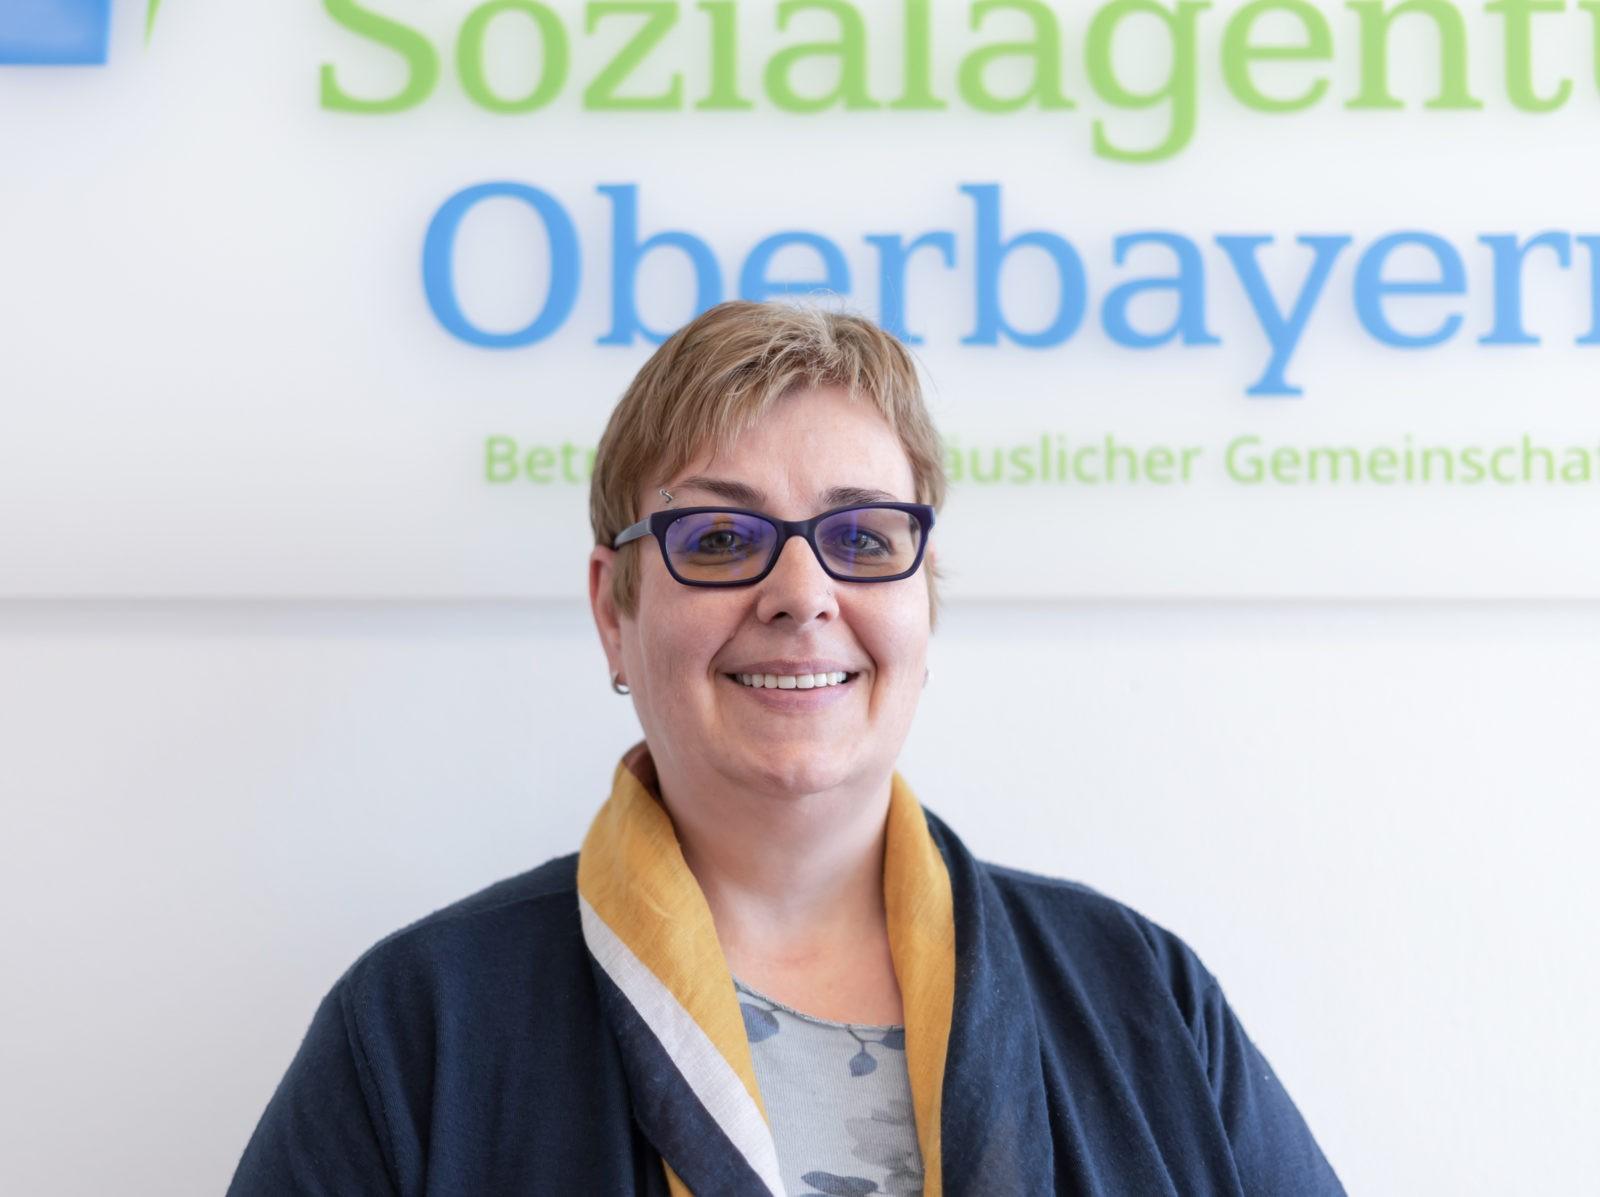 Antje Lau, Sozialagentur Bayern